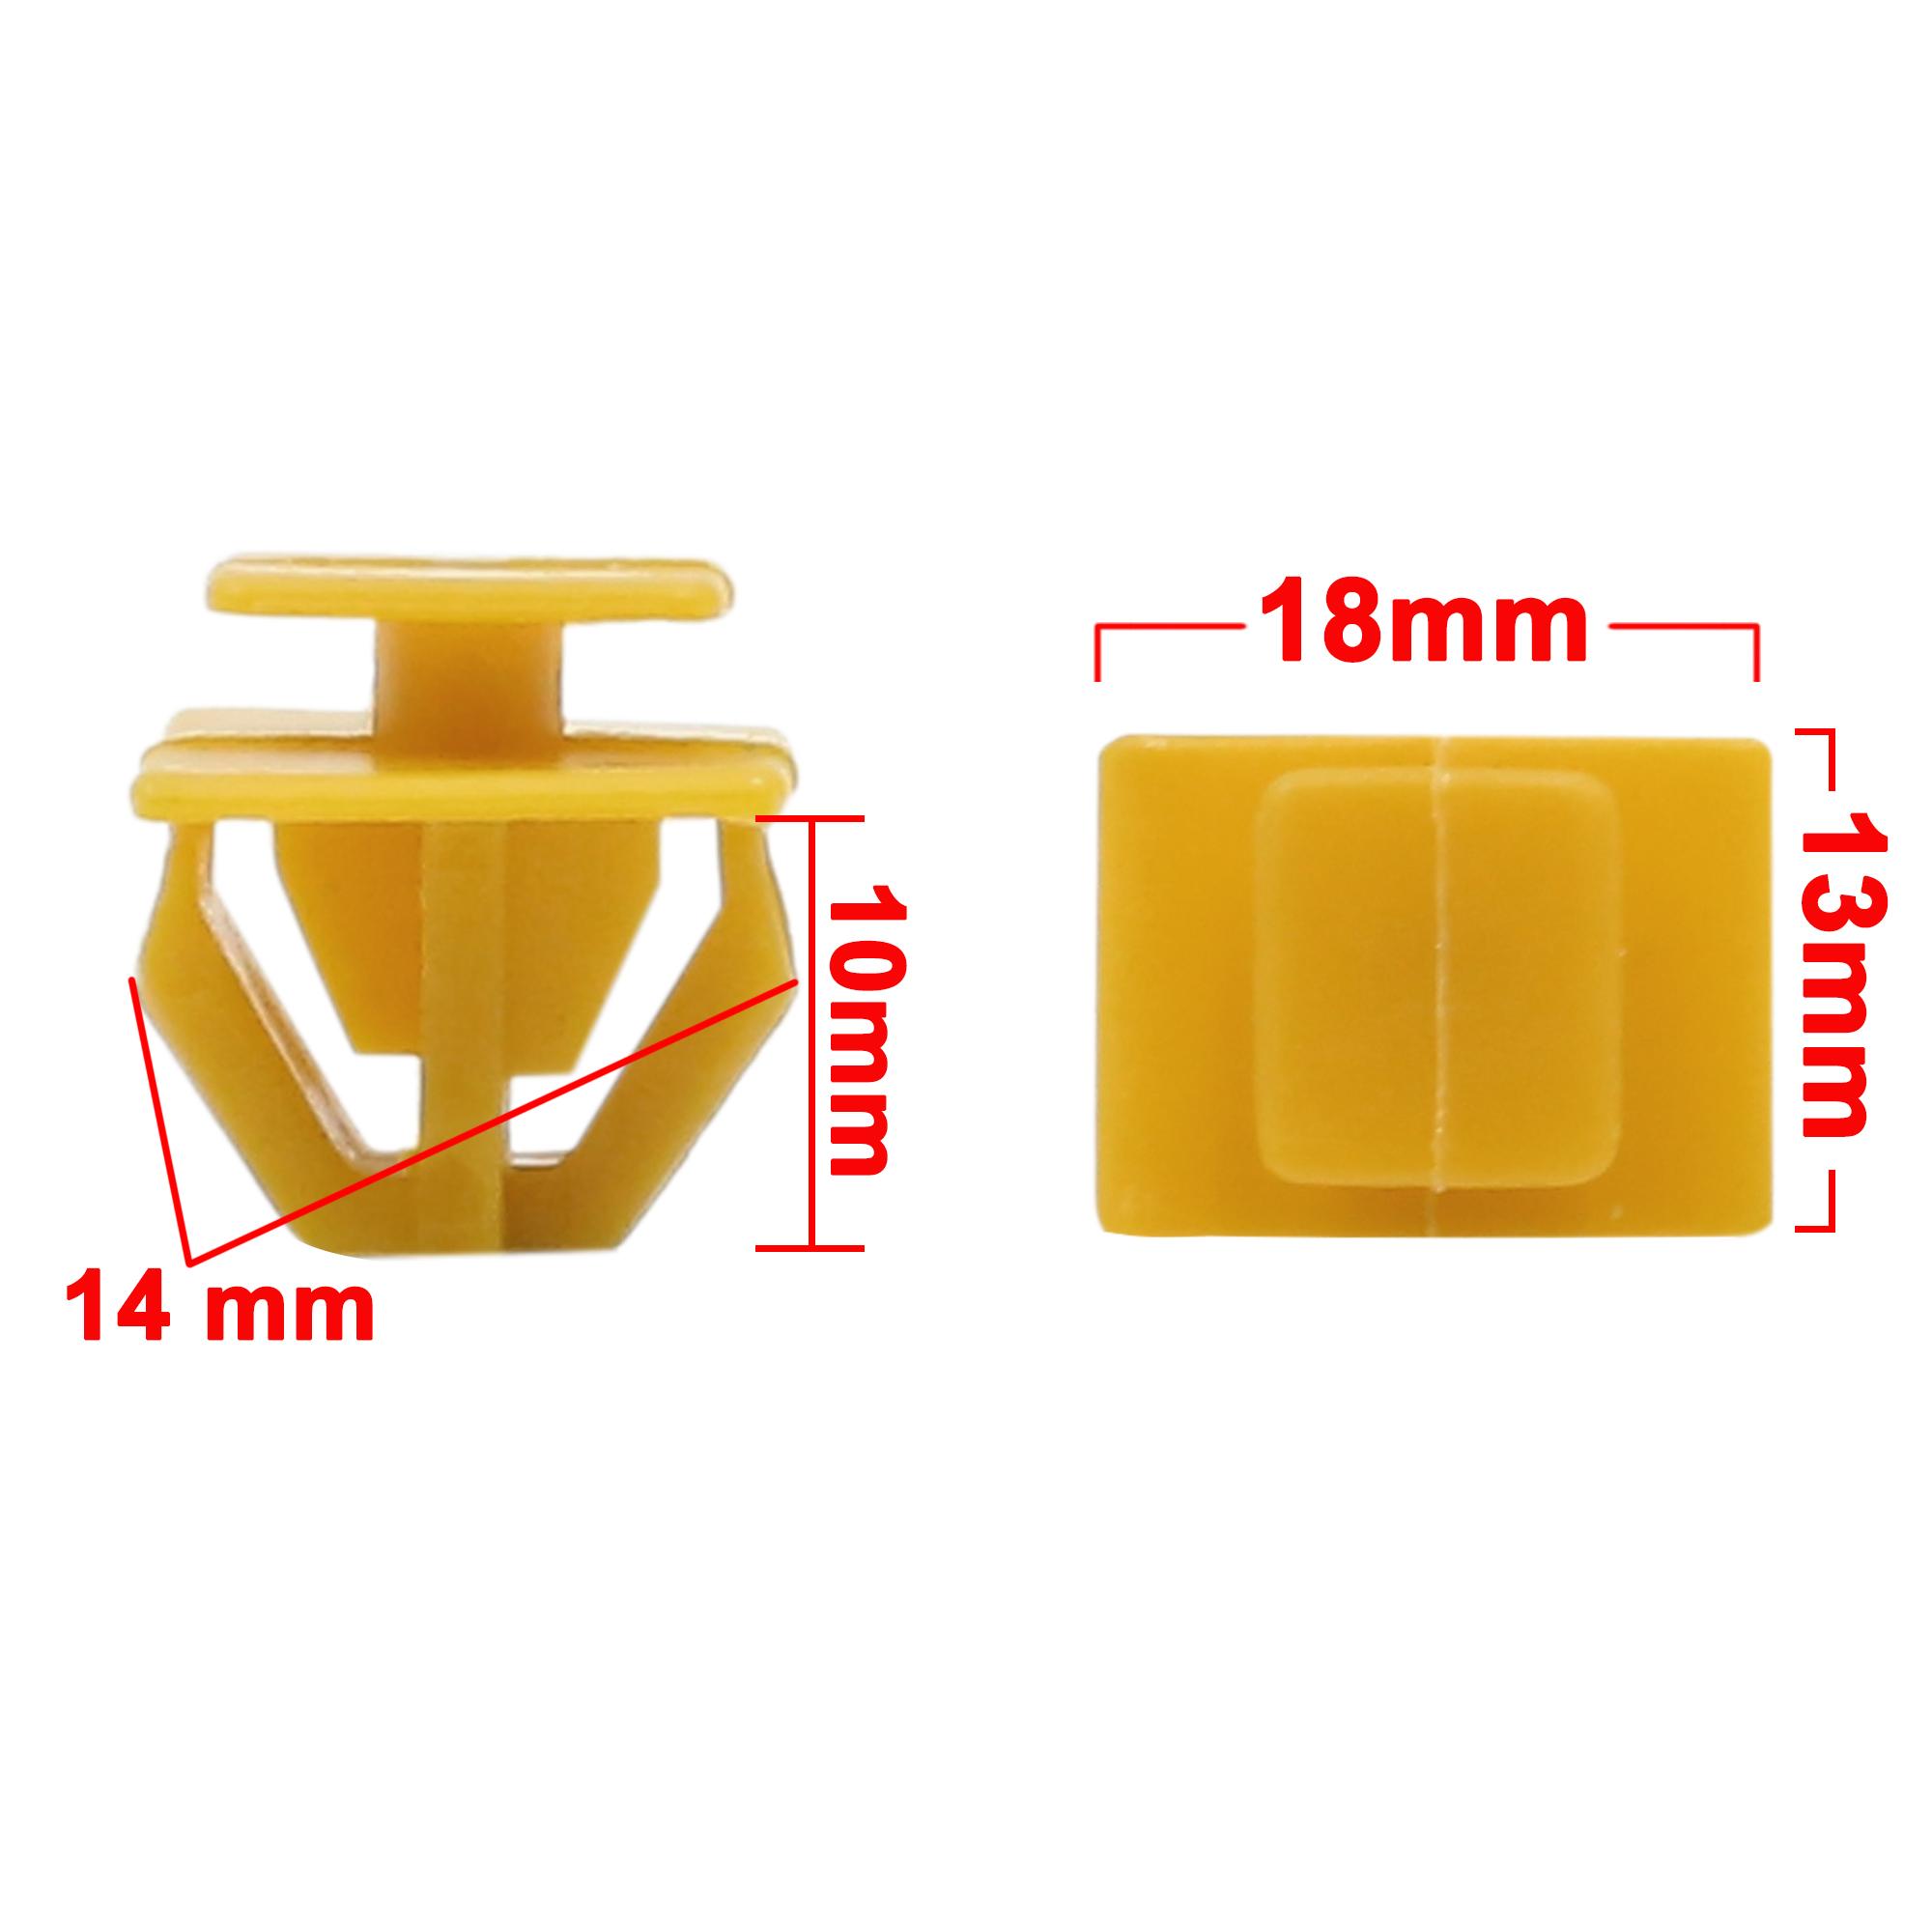 30pcs Yellow Car Trim Door Panel Retainers Bumper Fender Plastic Rivets Clips - image 1 of 2